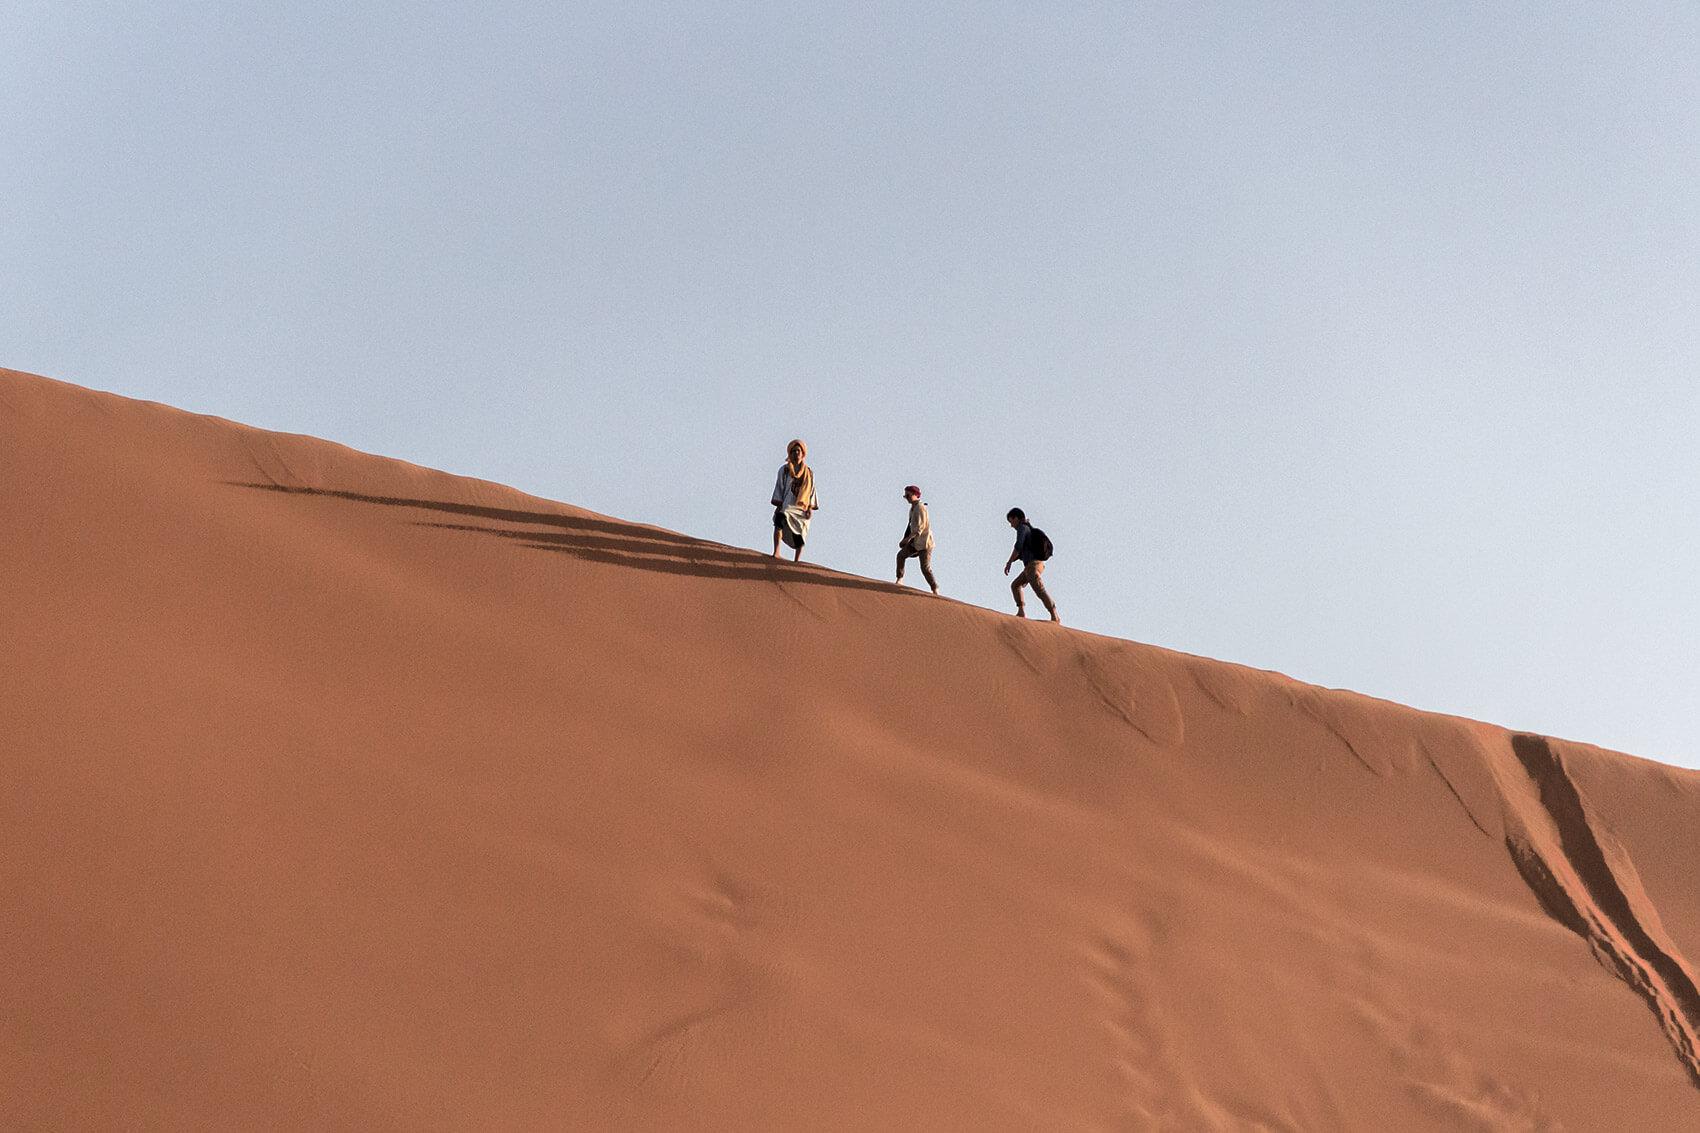 Cruising Erg Chebbi desert